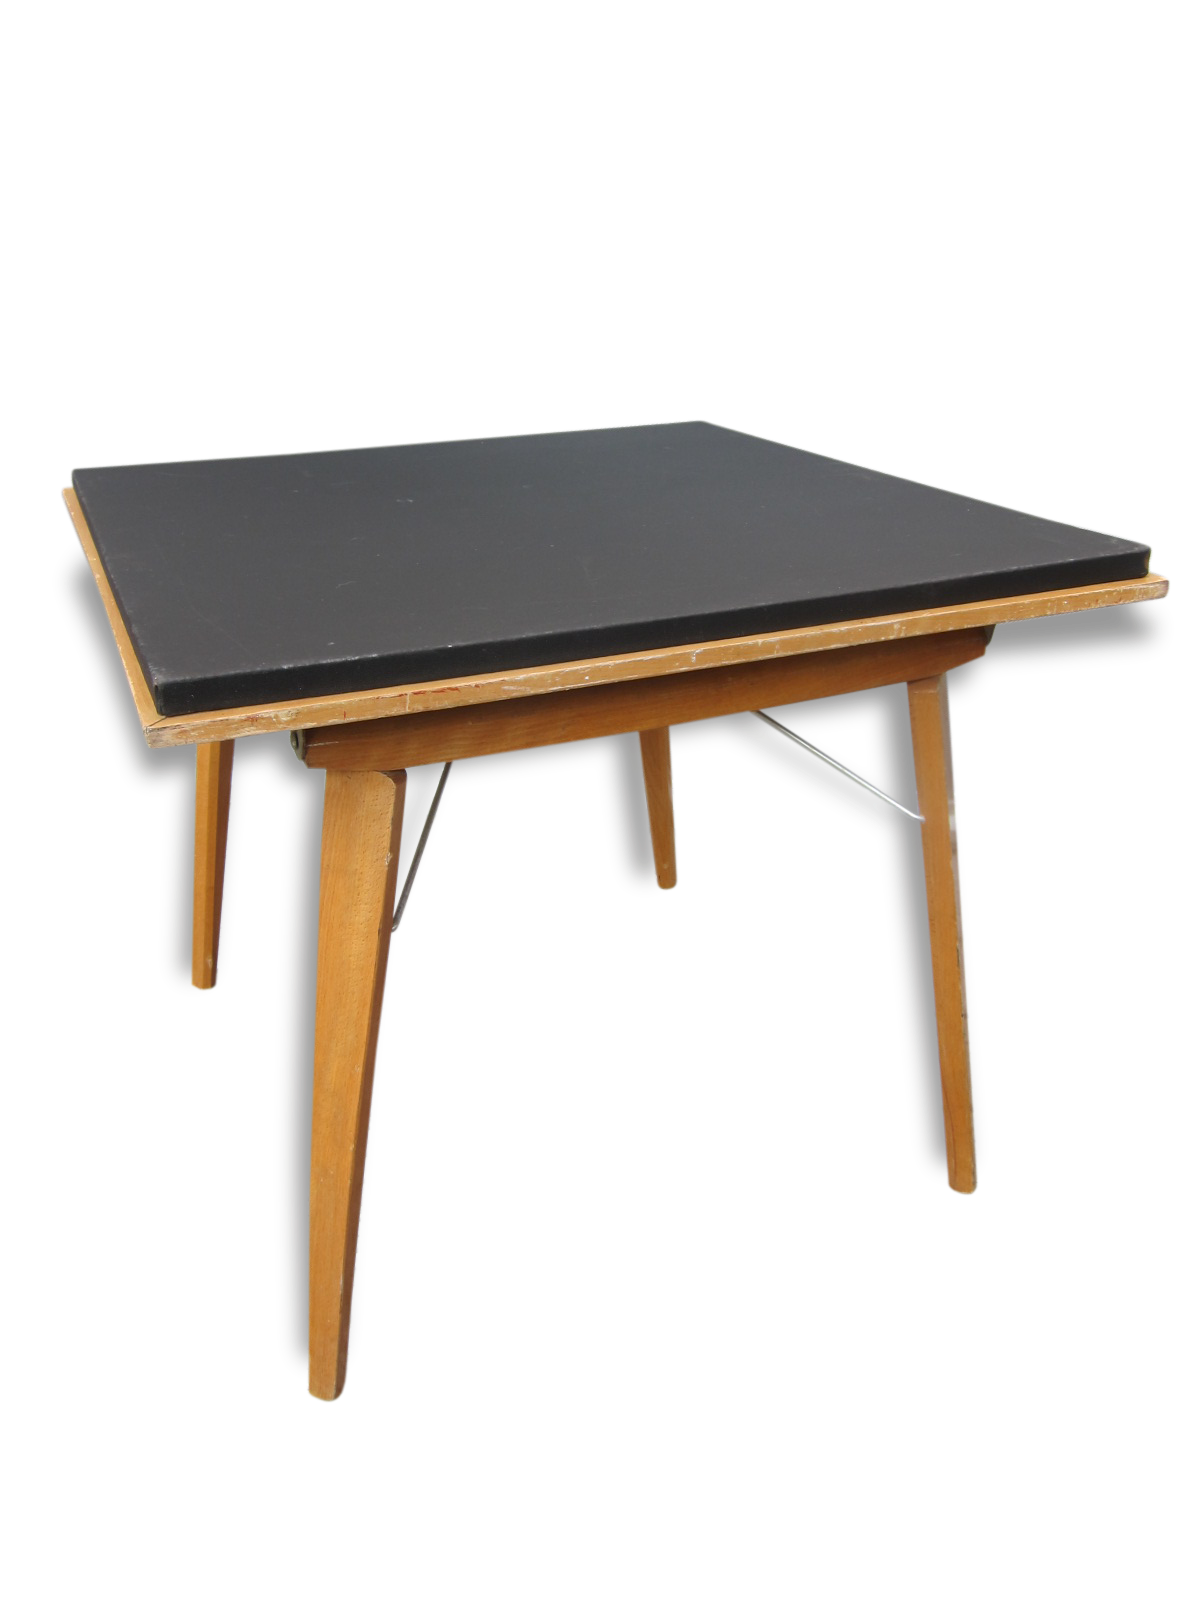 table basse pliante bois simple table basse pliante bois. Black Bedroom Furniture Sets. Home Design Ideas